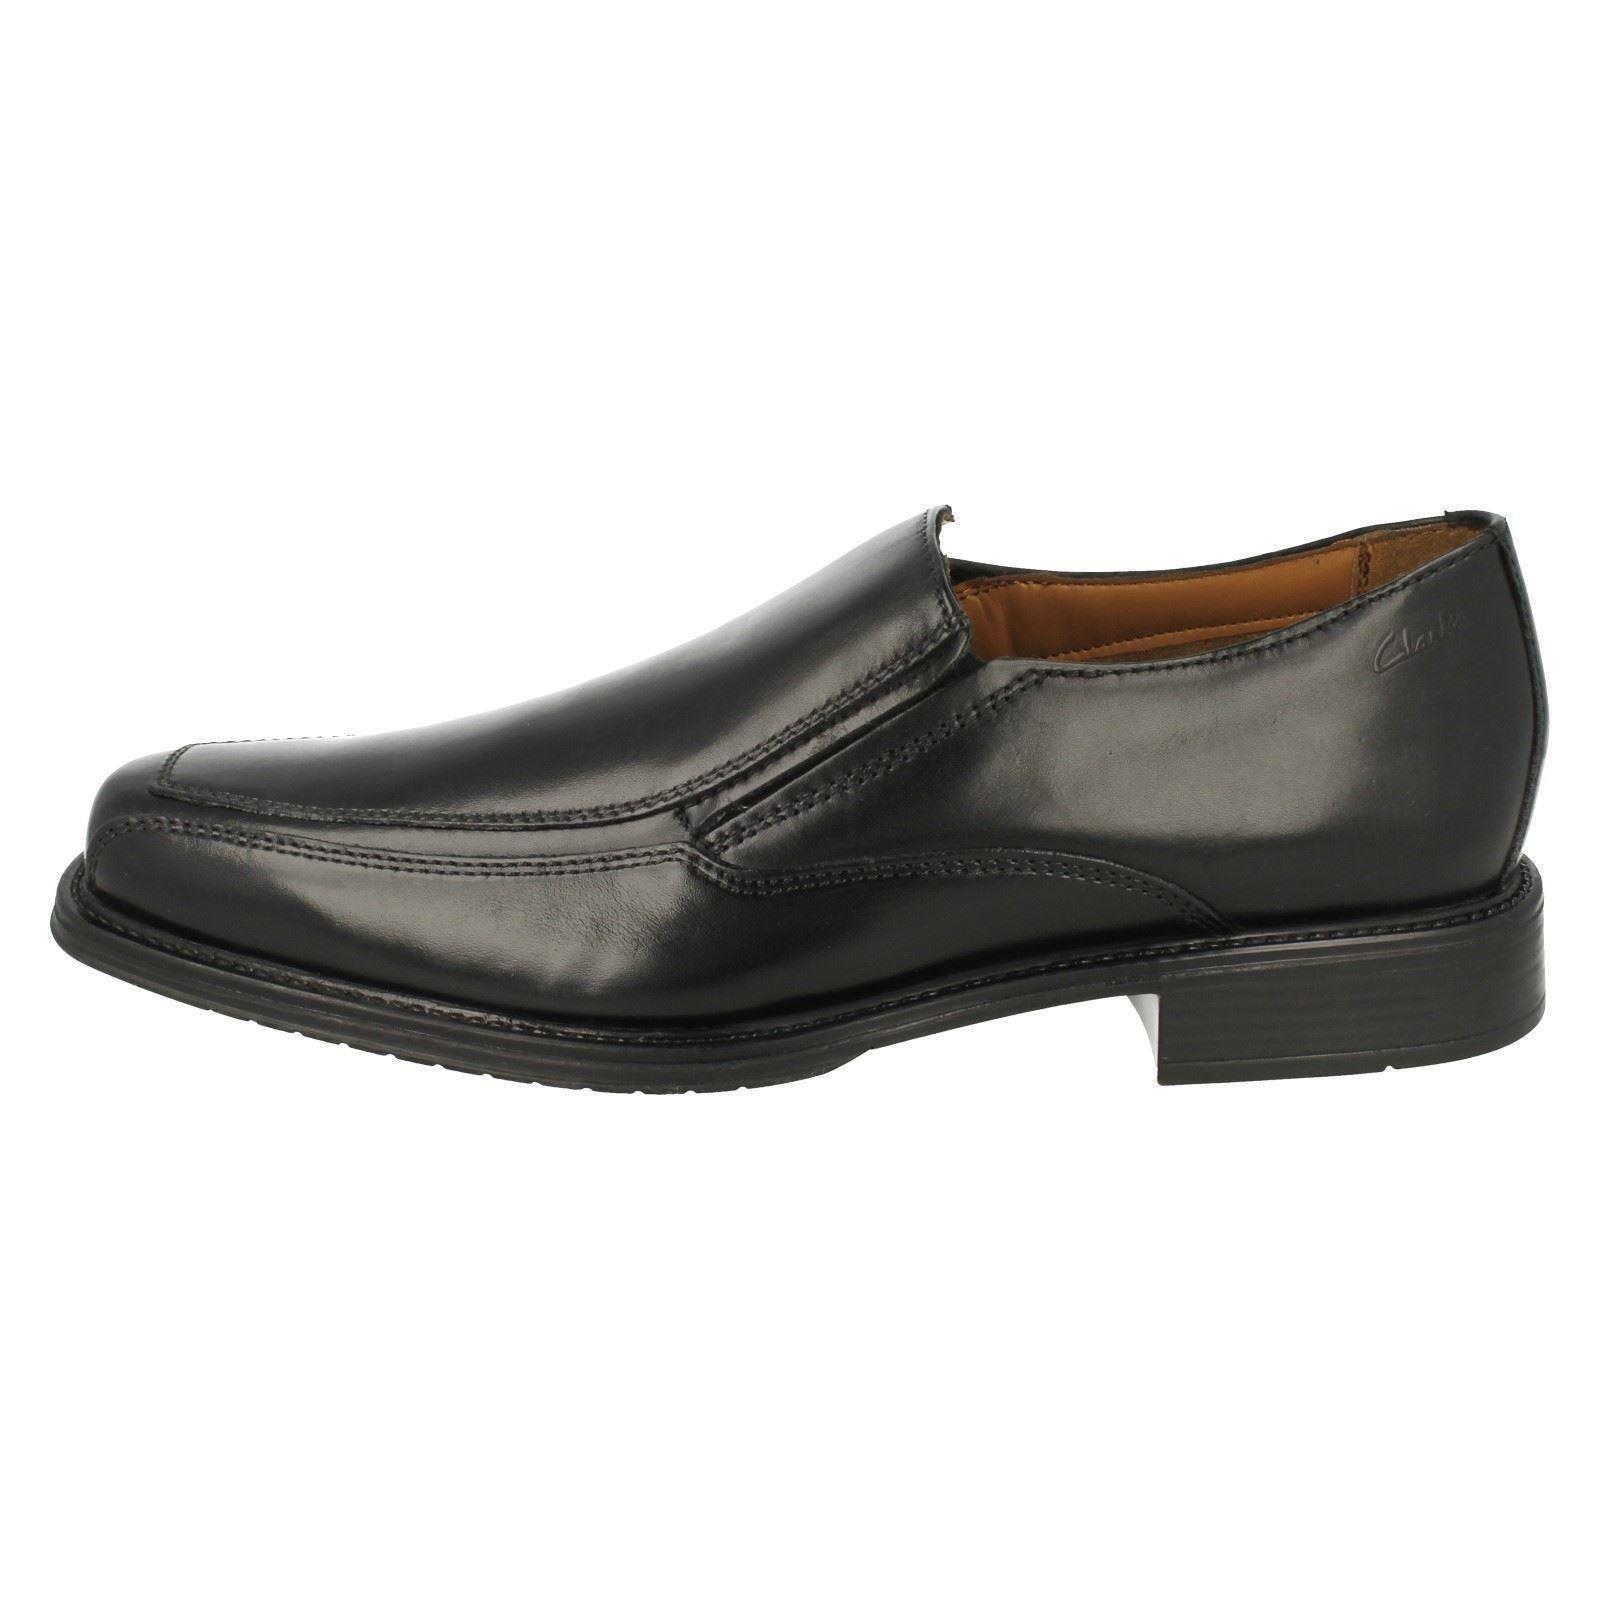 chaussures à enfiler driggs les clarks formelle driggs enfiler libre bd9ae6